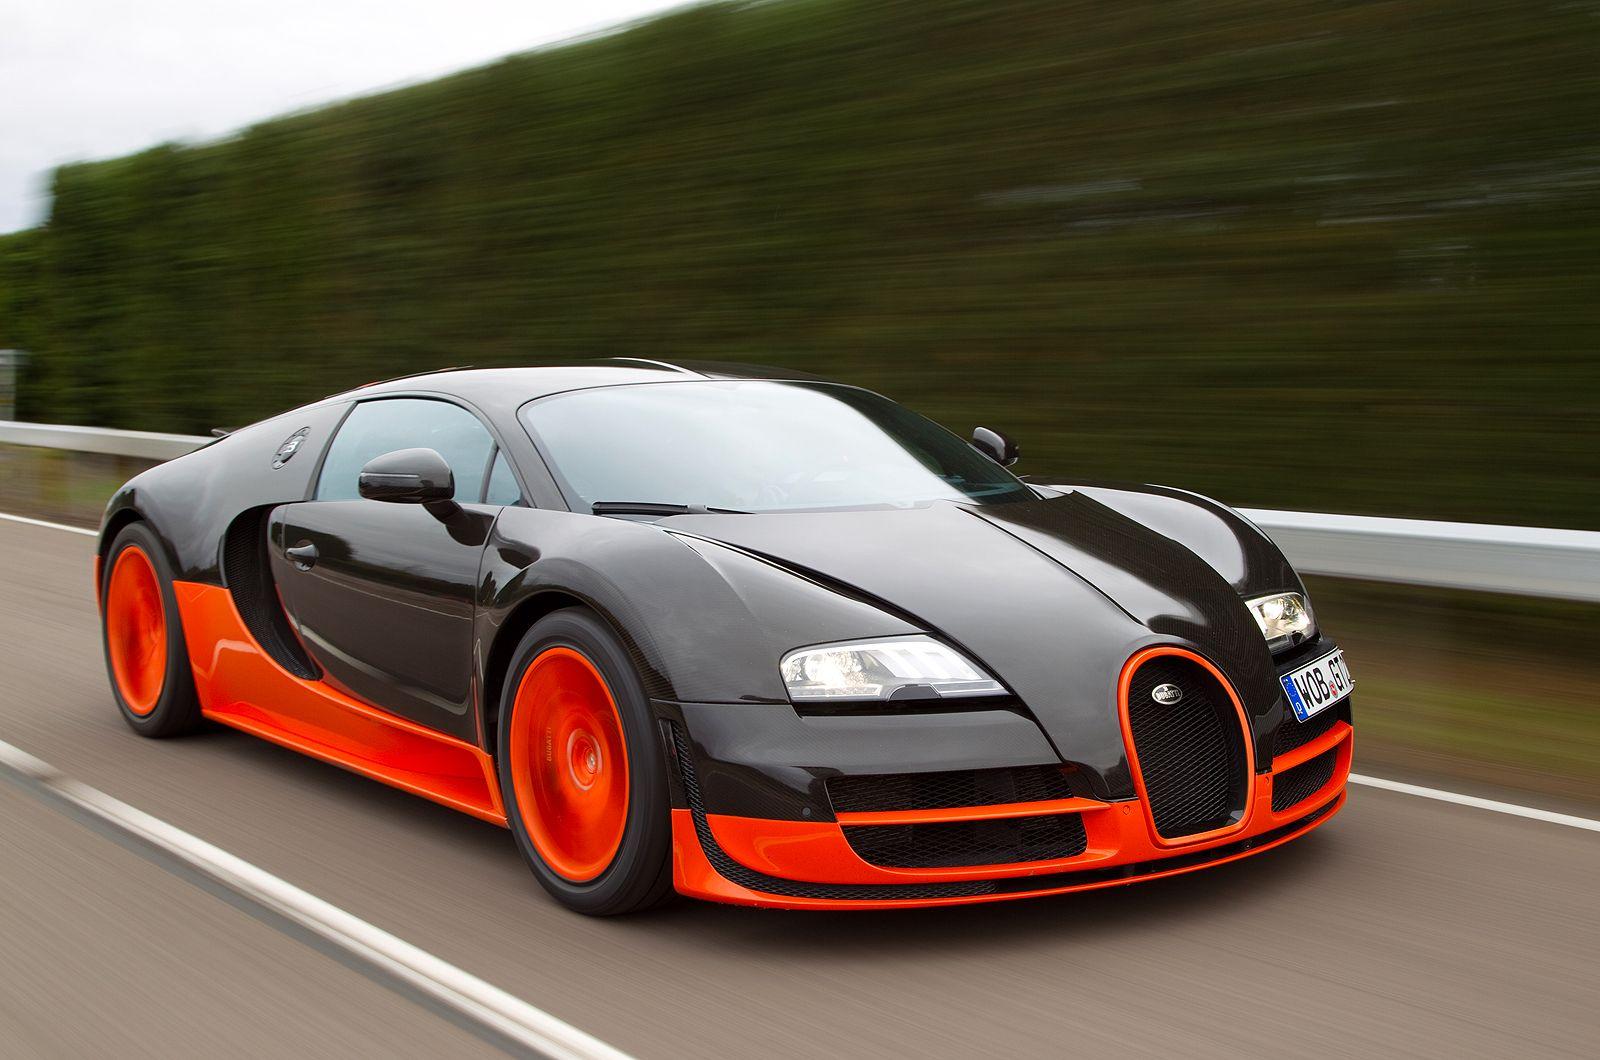 Bugatti Veyron Sports Showroom Bugatti Veyron Supersport Places